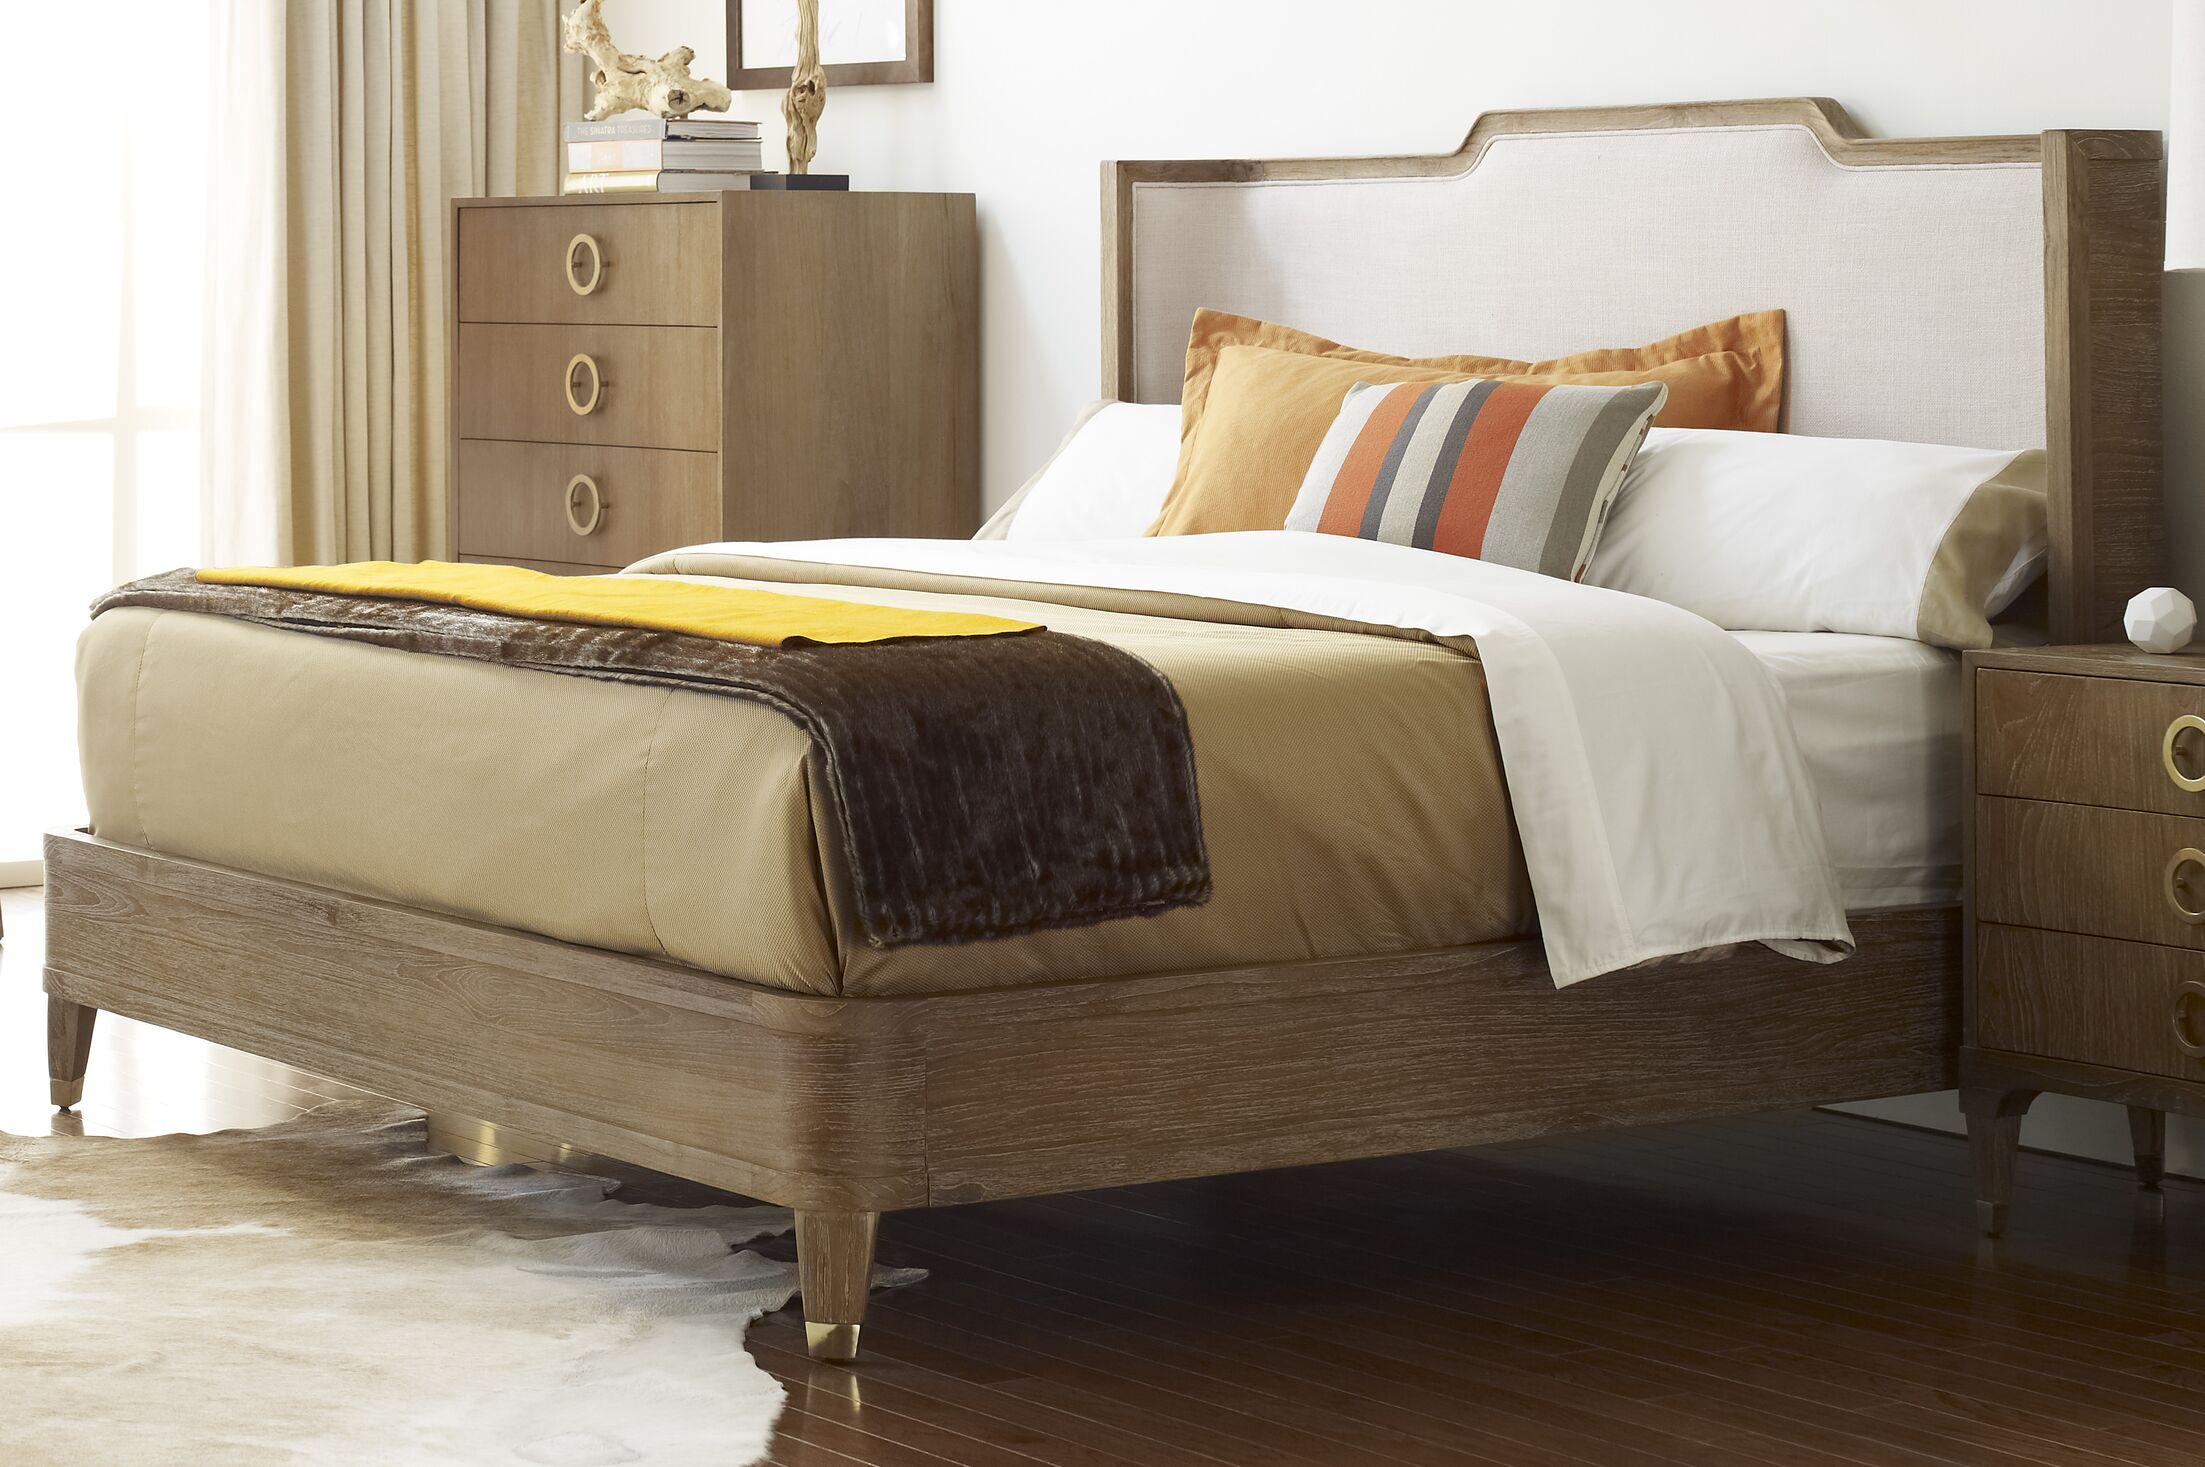 Atherton Upholstered Panel Headboard Color: Cerused Teak / Brushed Brass, Size: California King